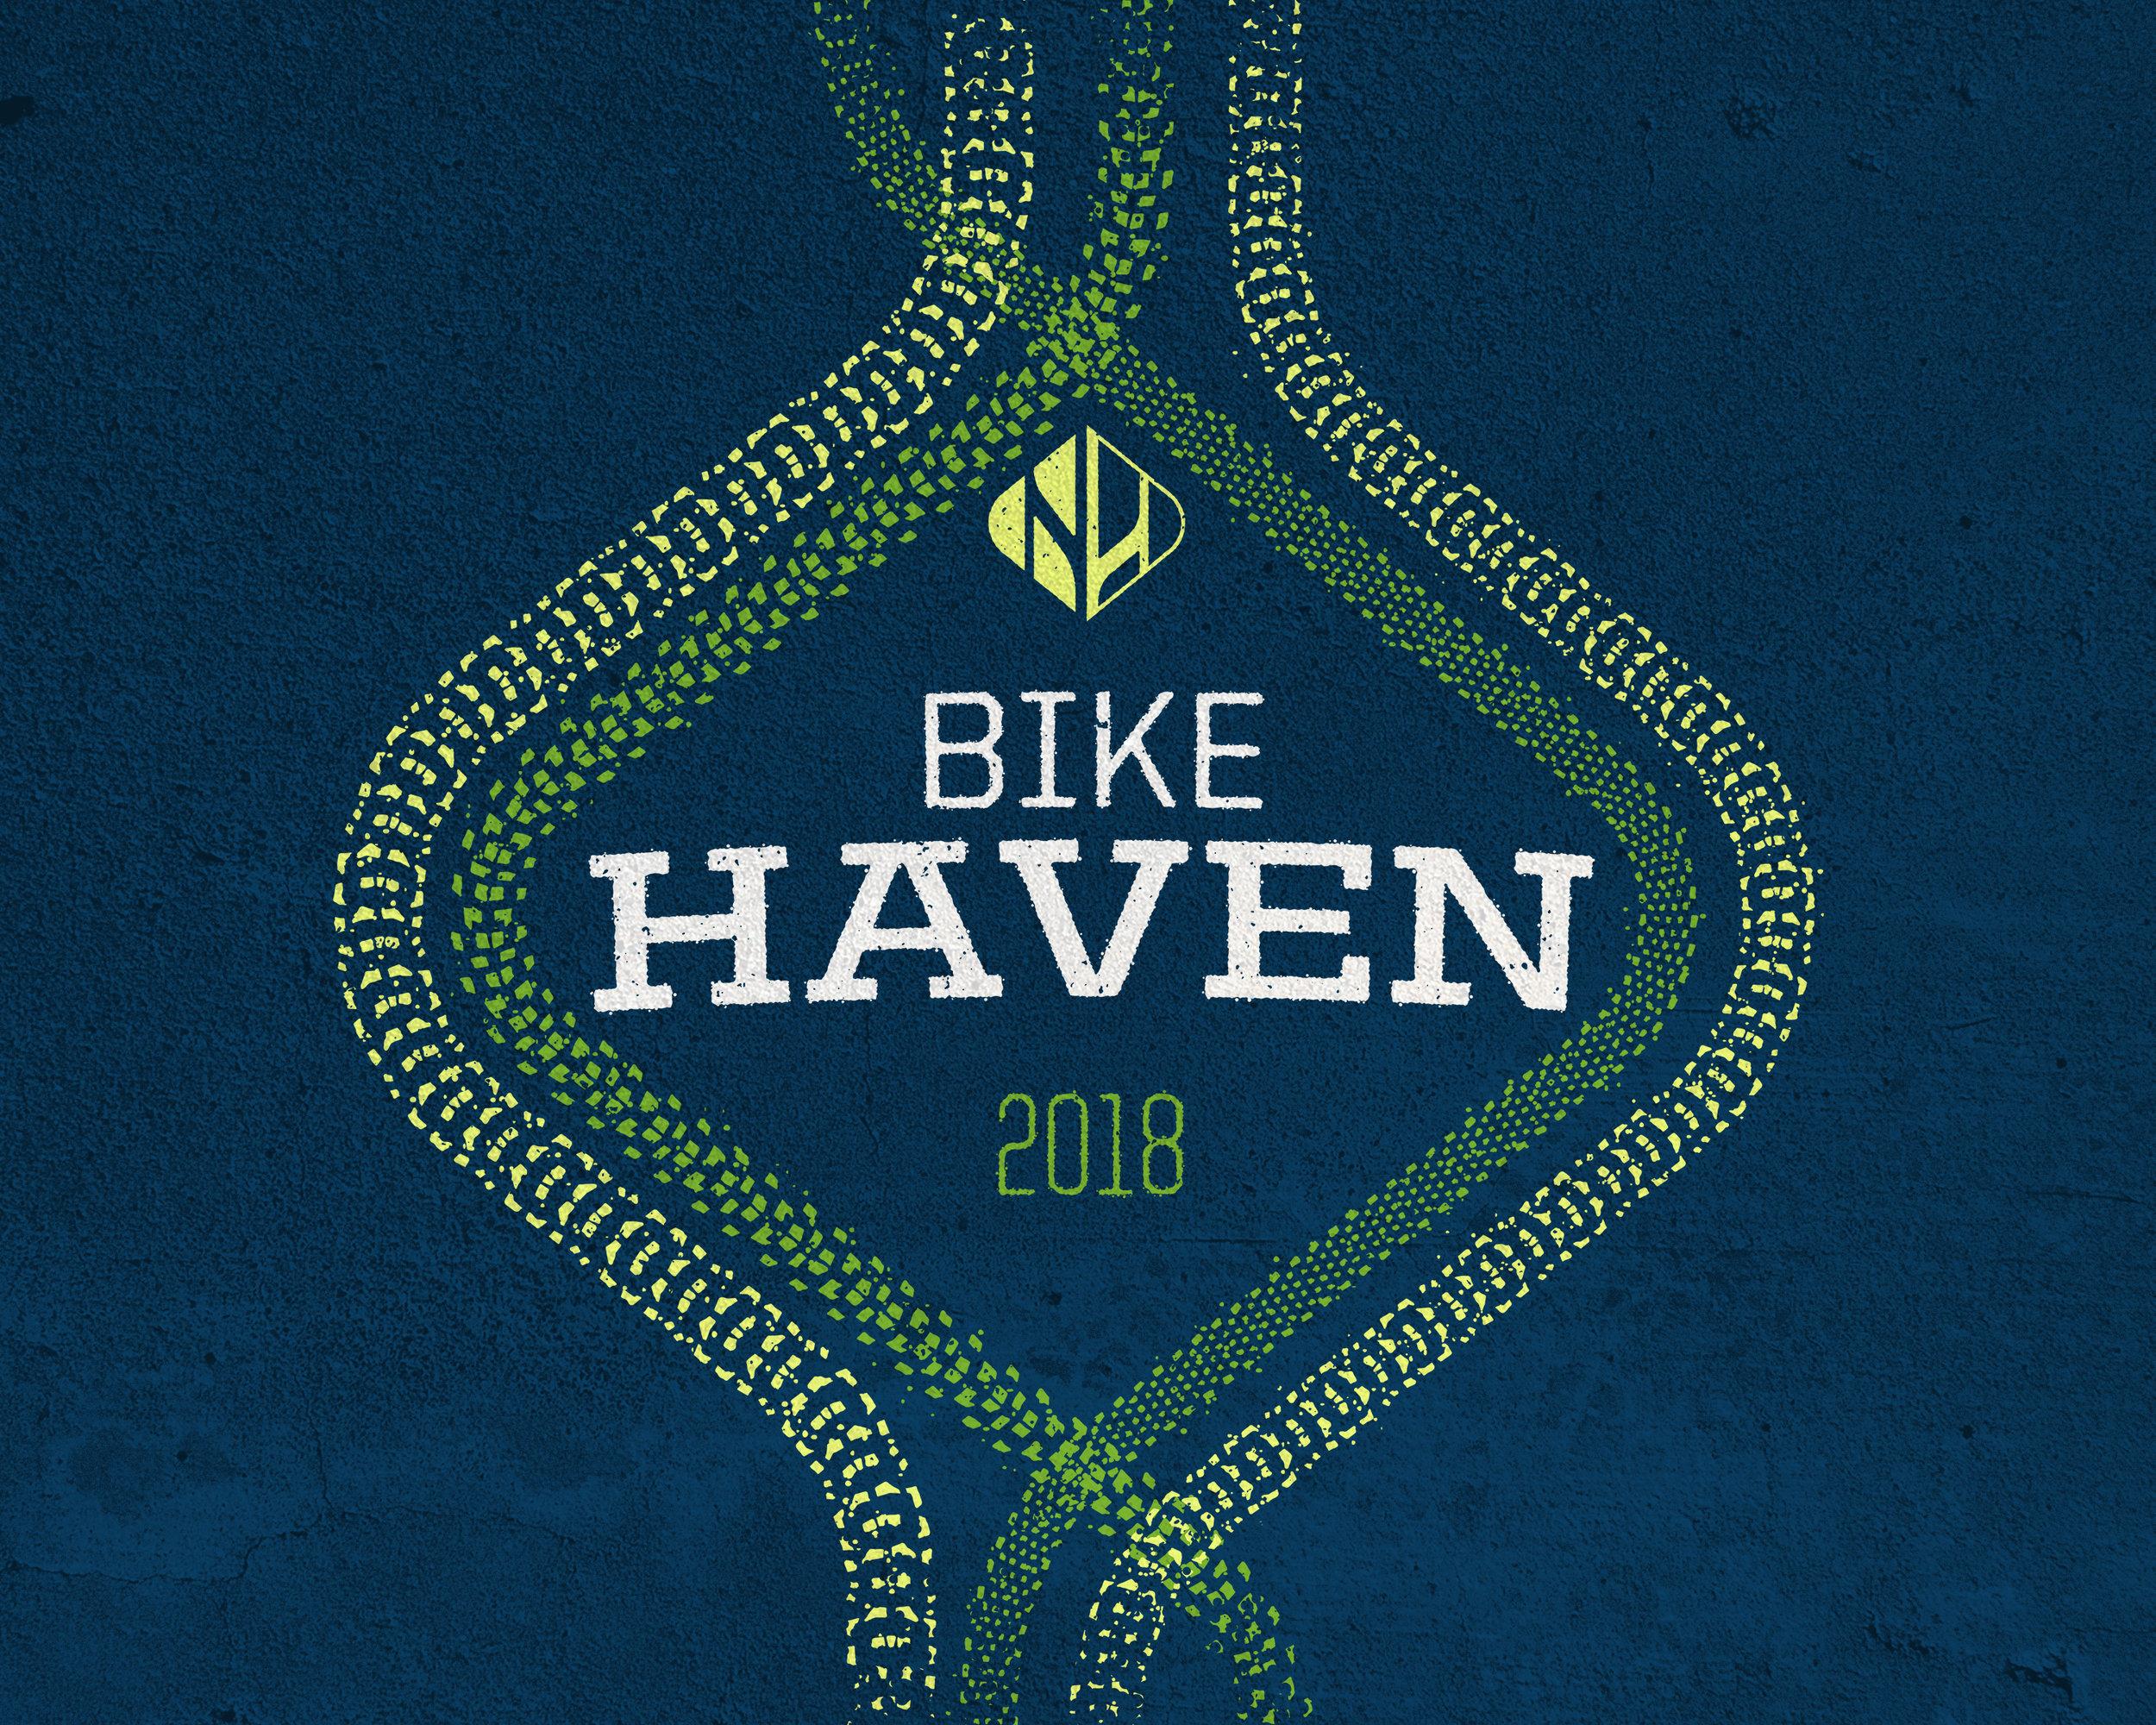 BikeHaven-2018.jpg